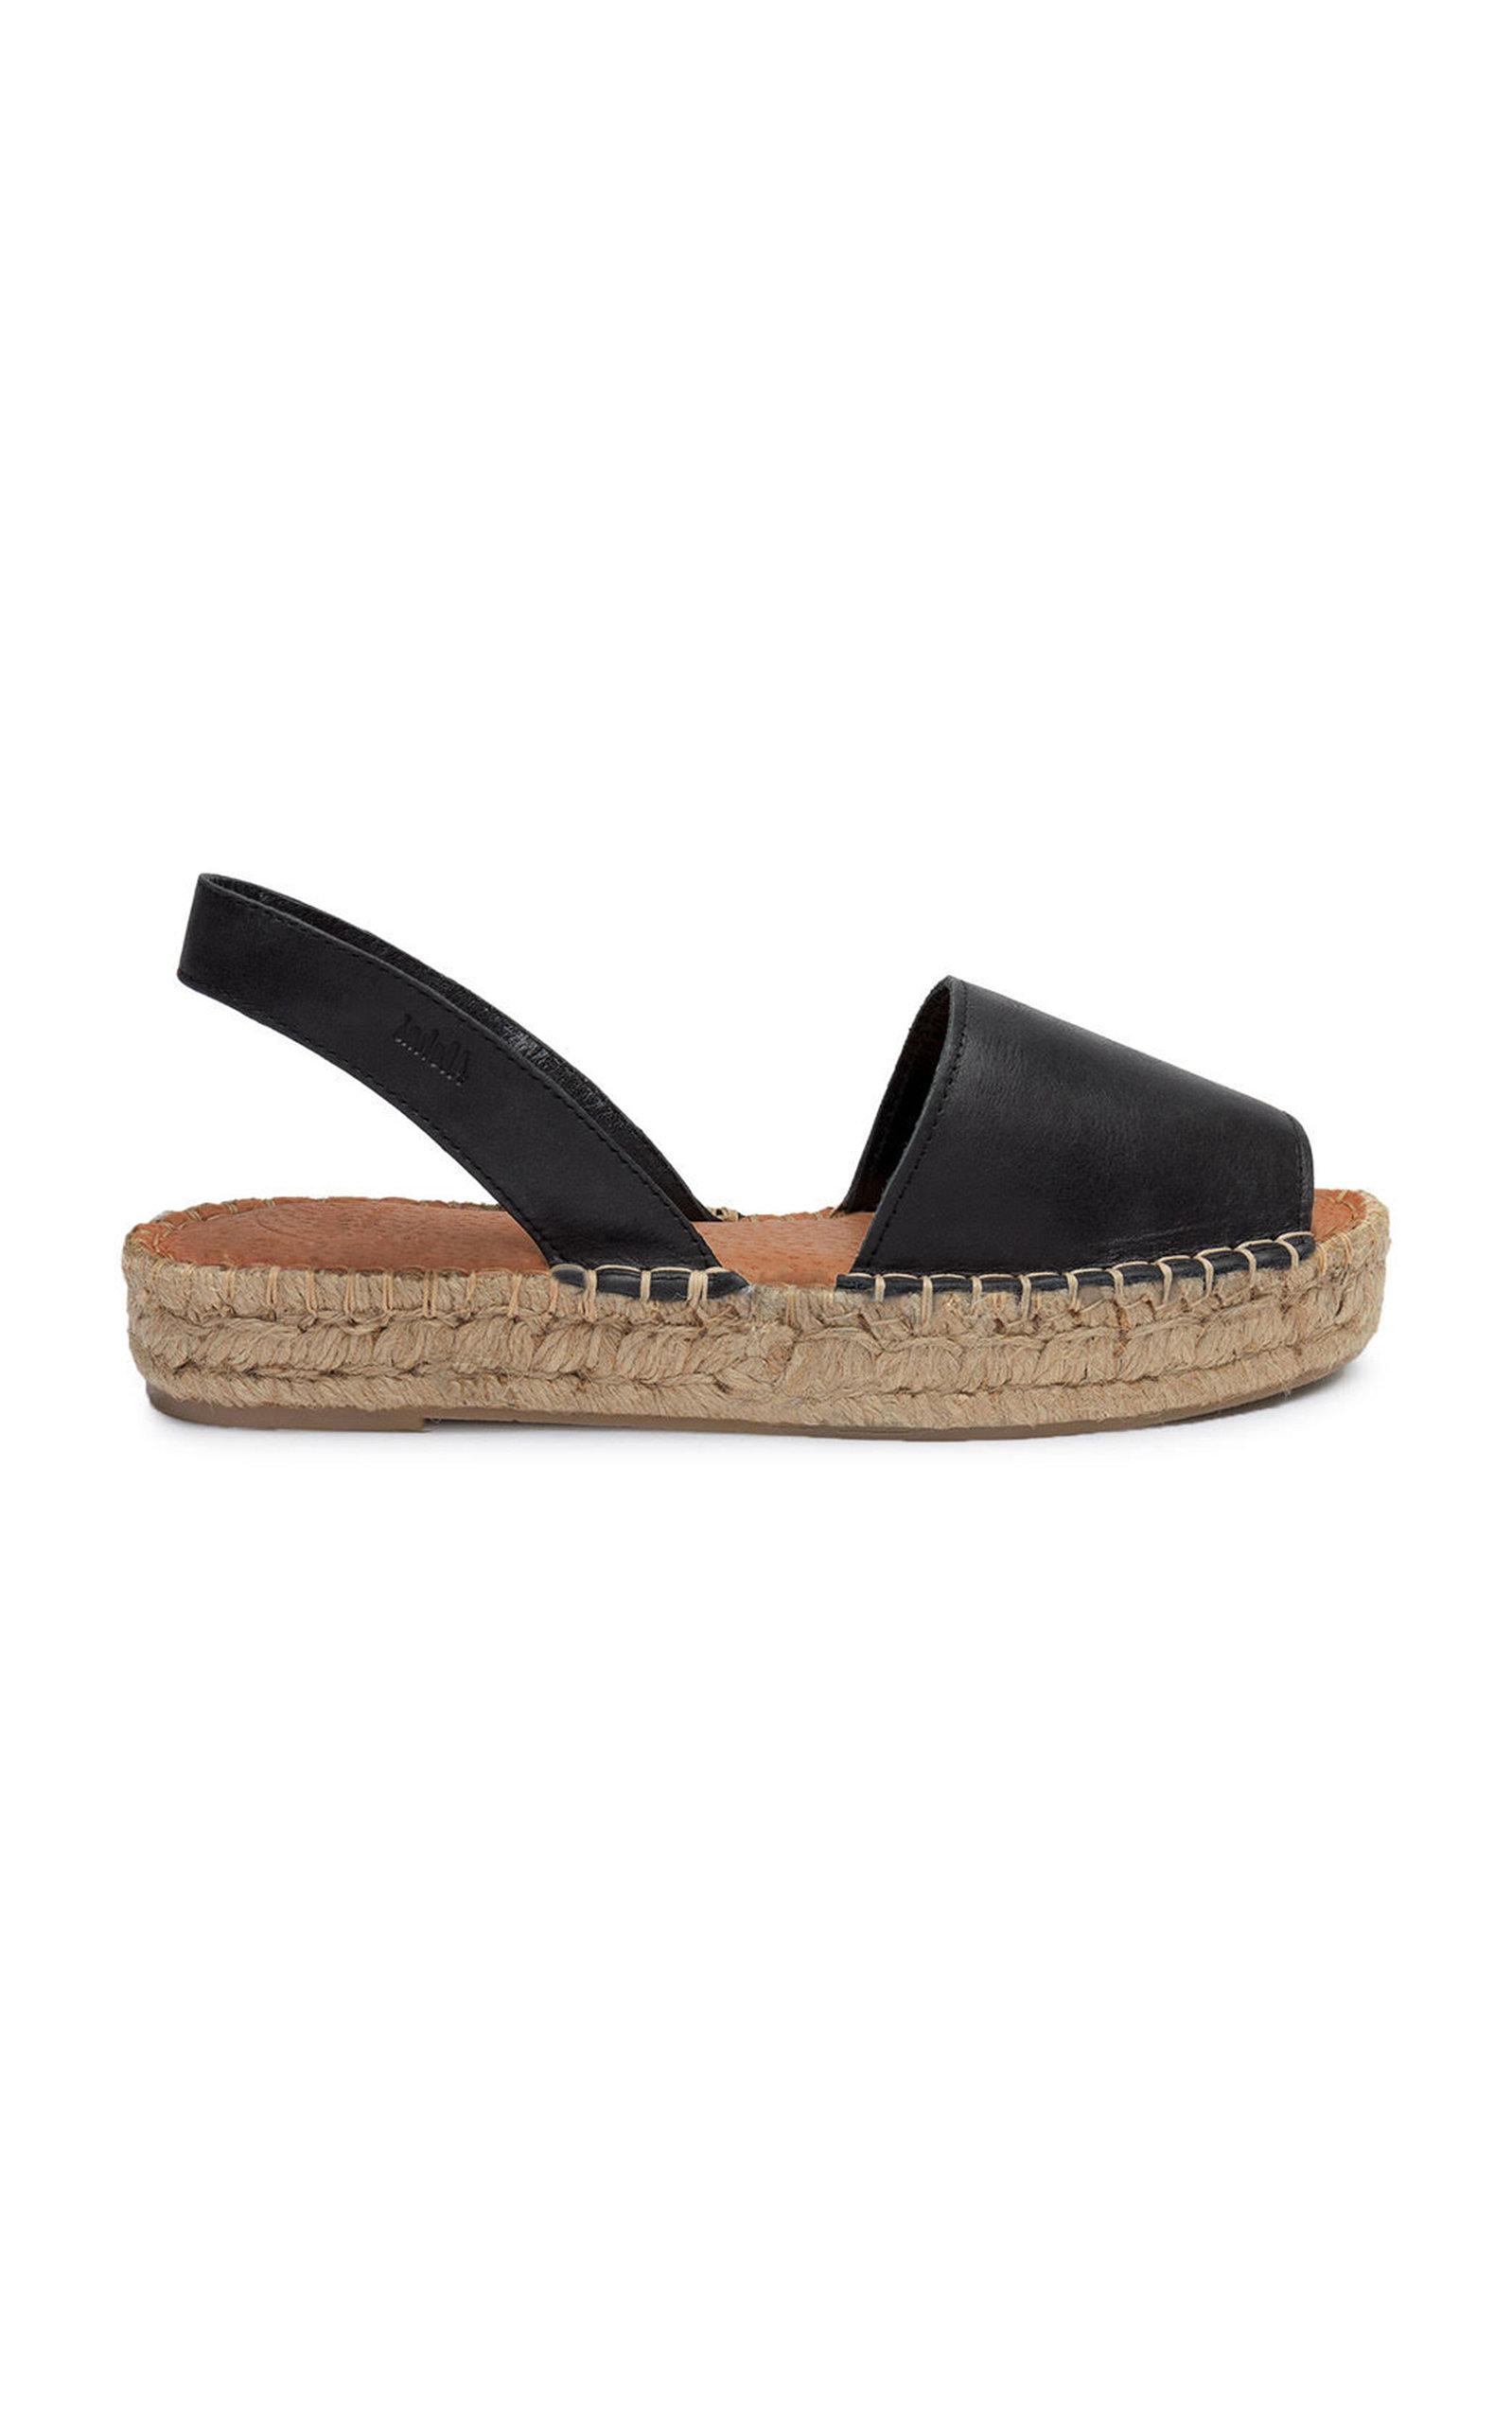 ALOHAS SANDALS Ibizas Platform Sandal in Black